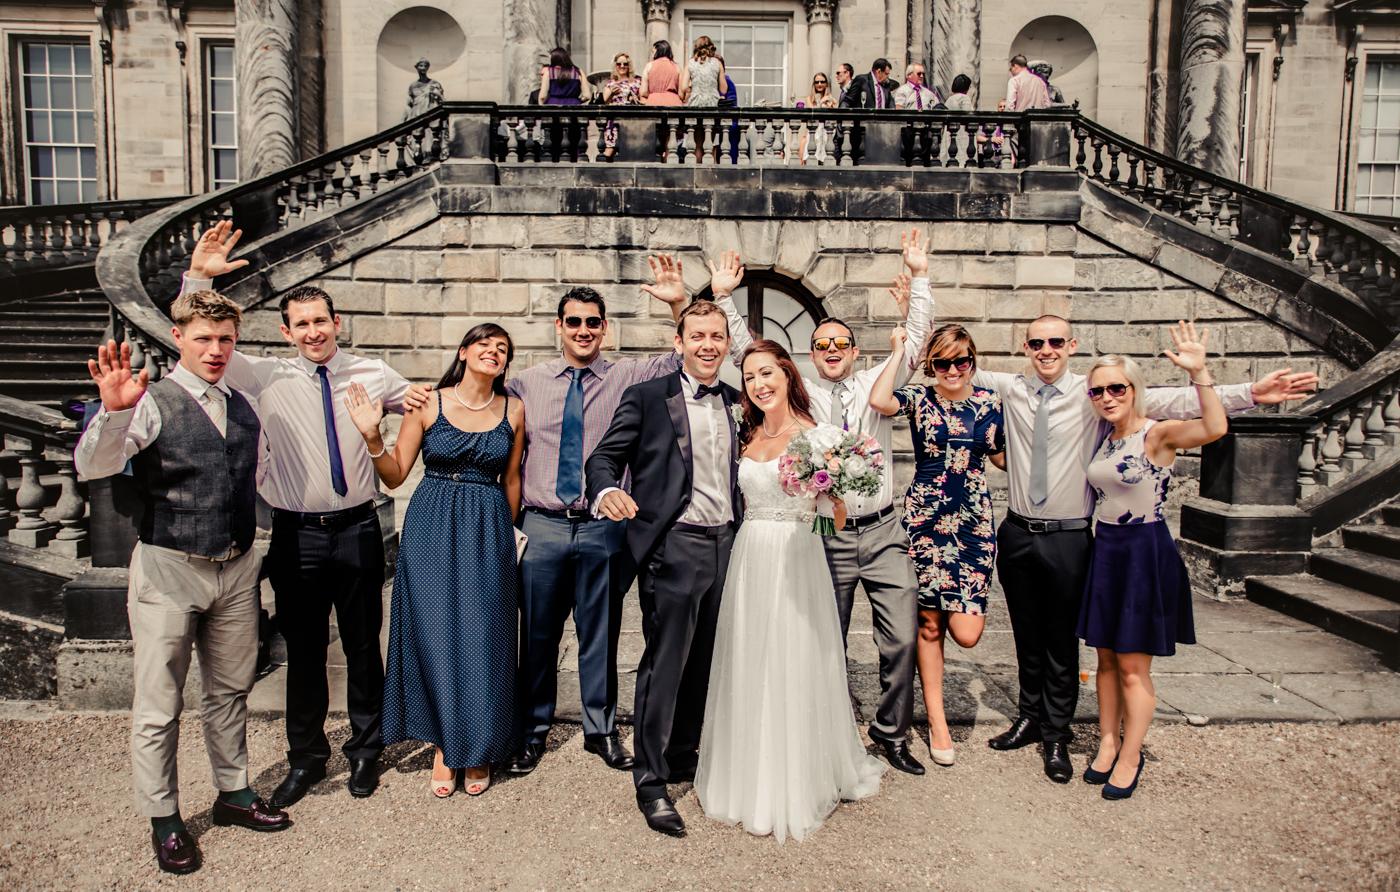 101 - Abi and Chris at Kedleston Hall - Wedding Photography by Mark Pugh www.markpugh.com - 0383.JPG